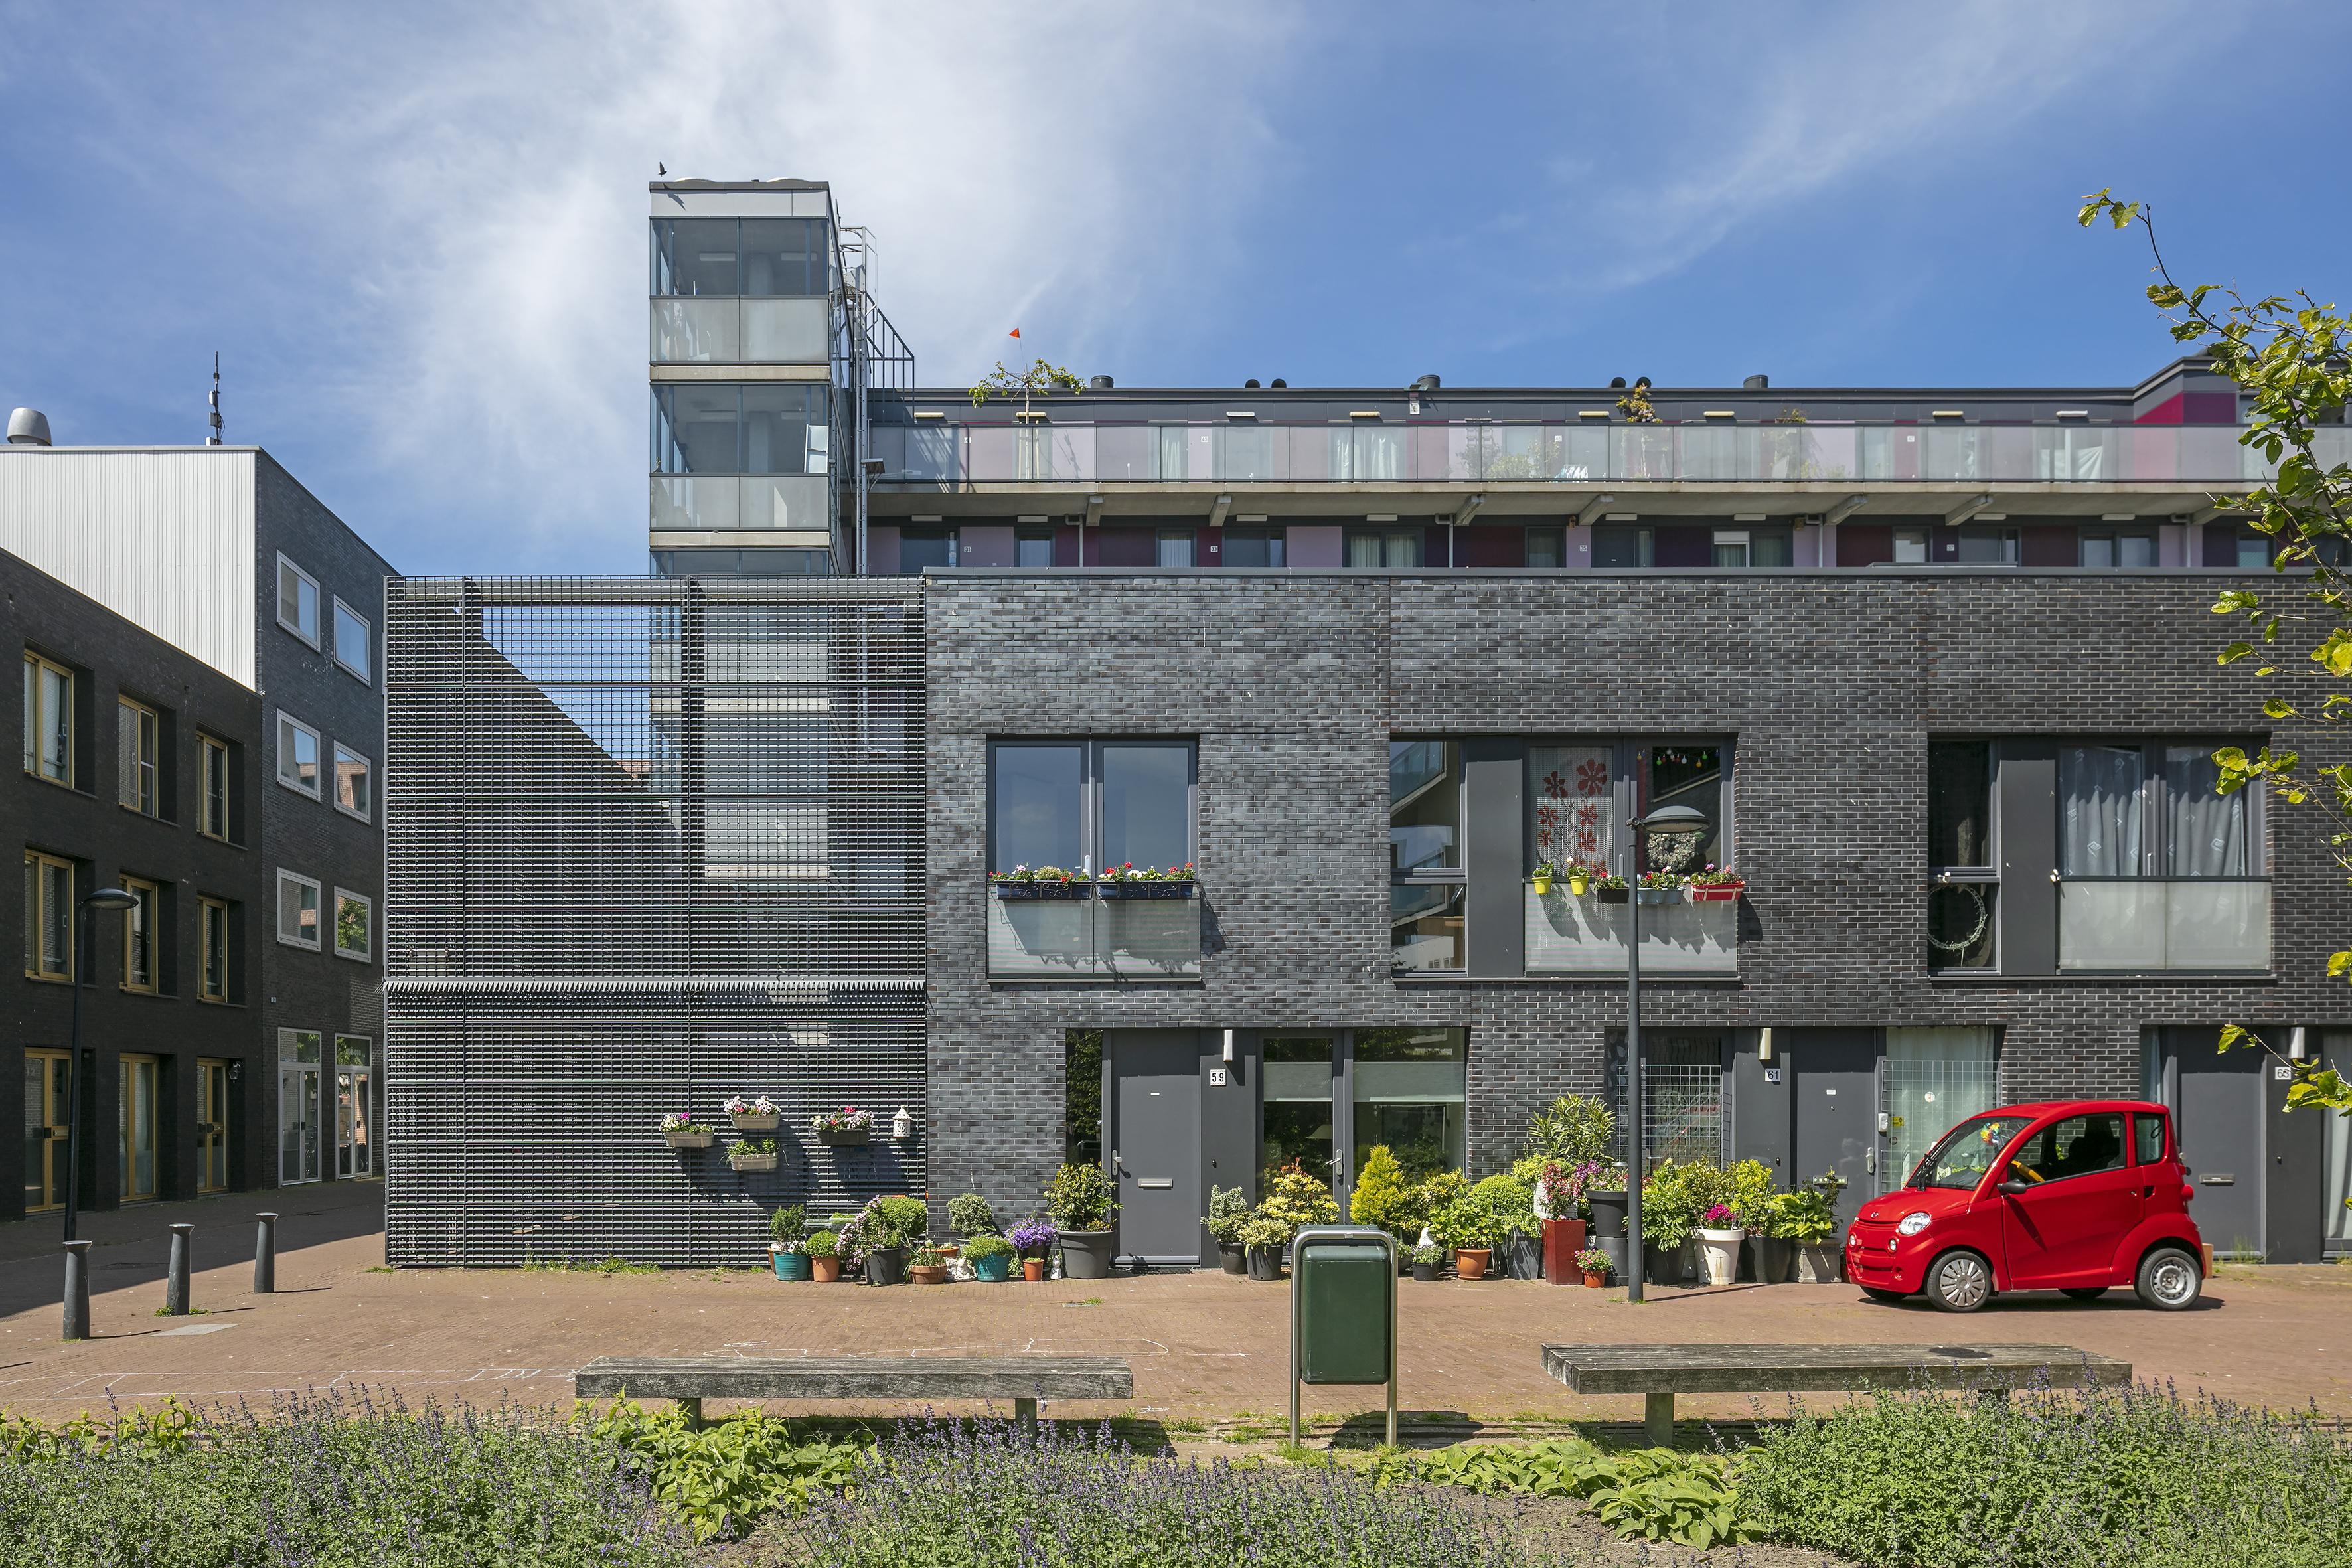 Gelaagd Hof – Haveneiland IJburg